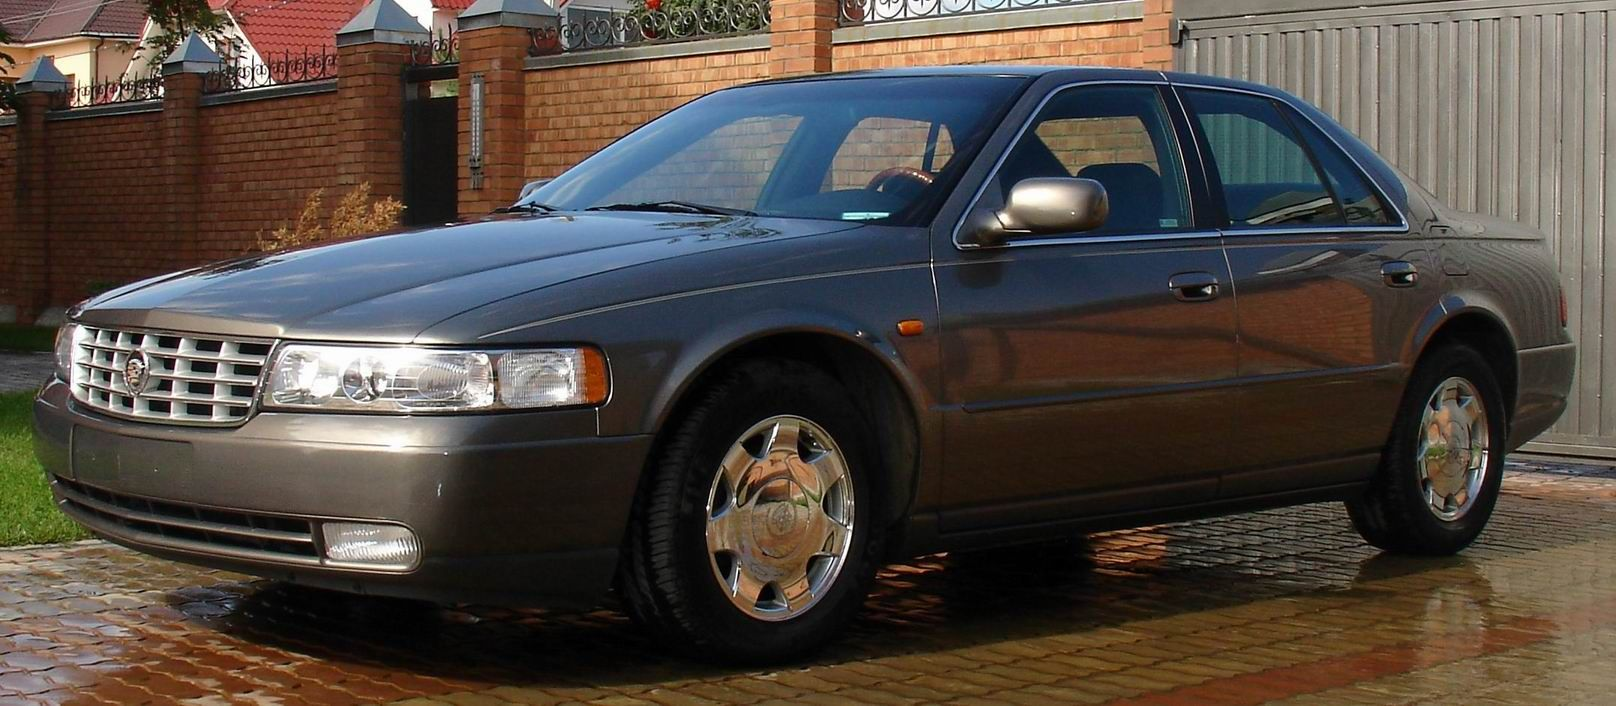 1999 Cadillac Seville Image 11